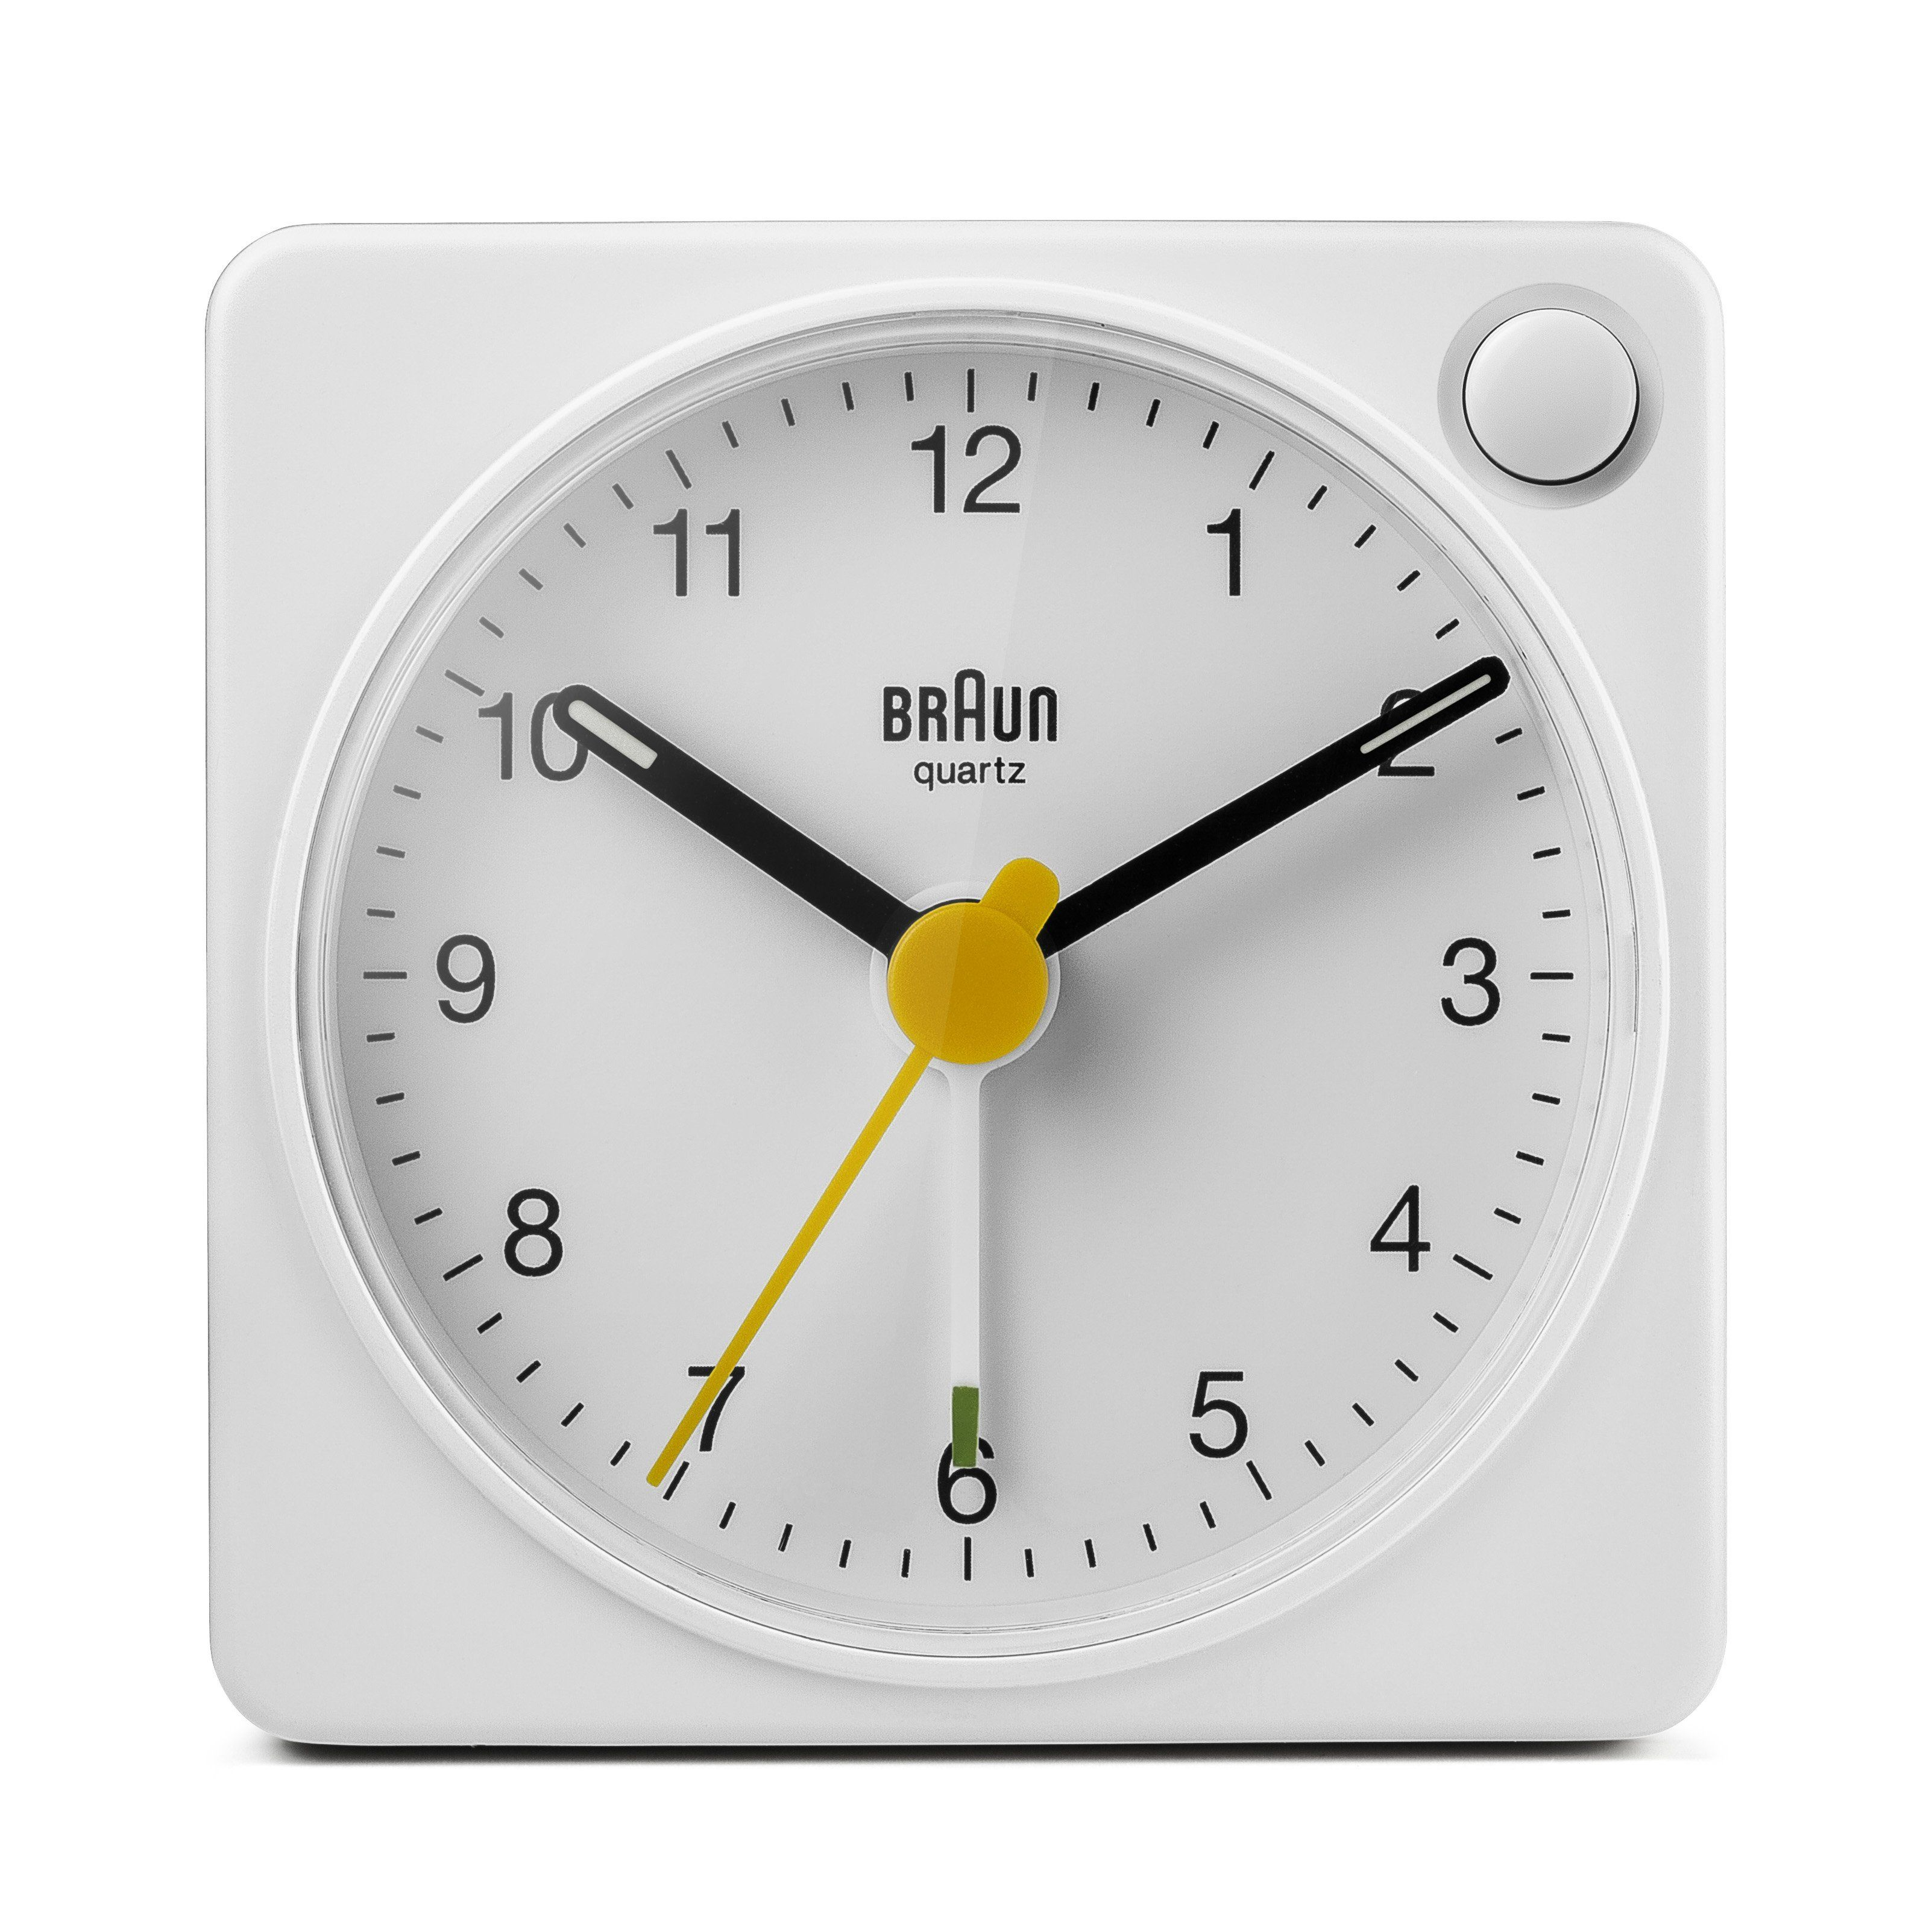 Braun Classic Travel Alarm Clock Bc2x In 2020 Braun Alarm Clock Alarm Clock Clock